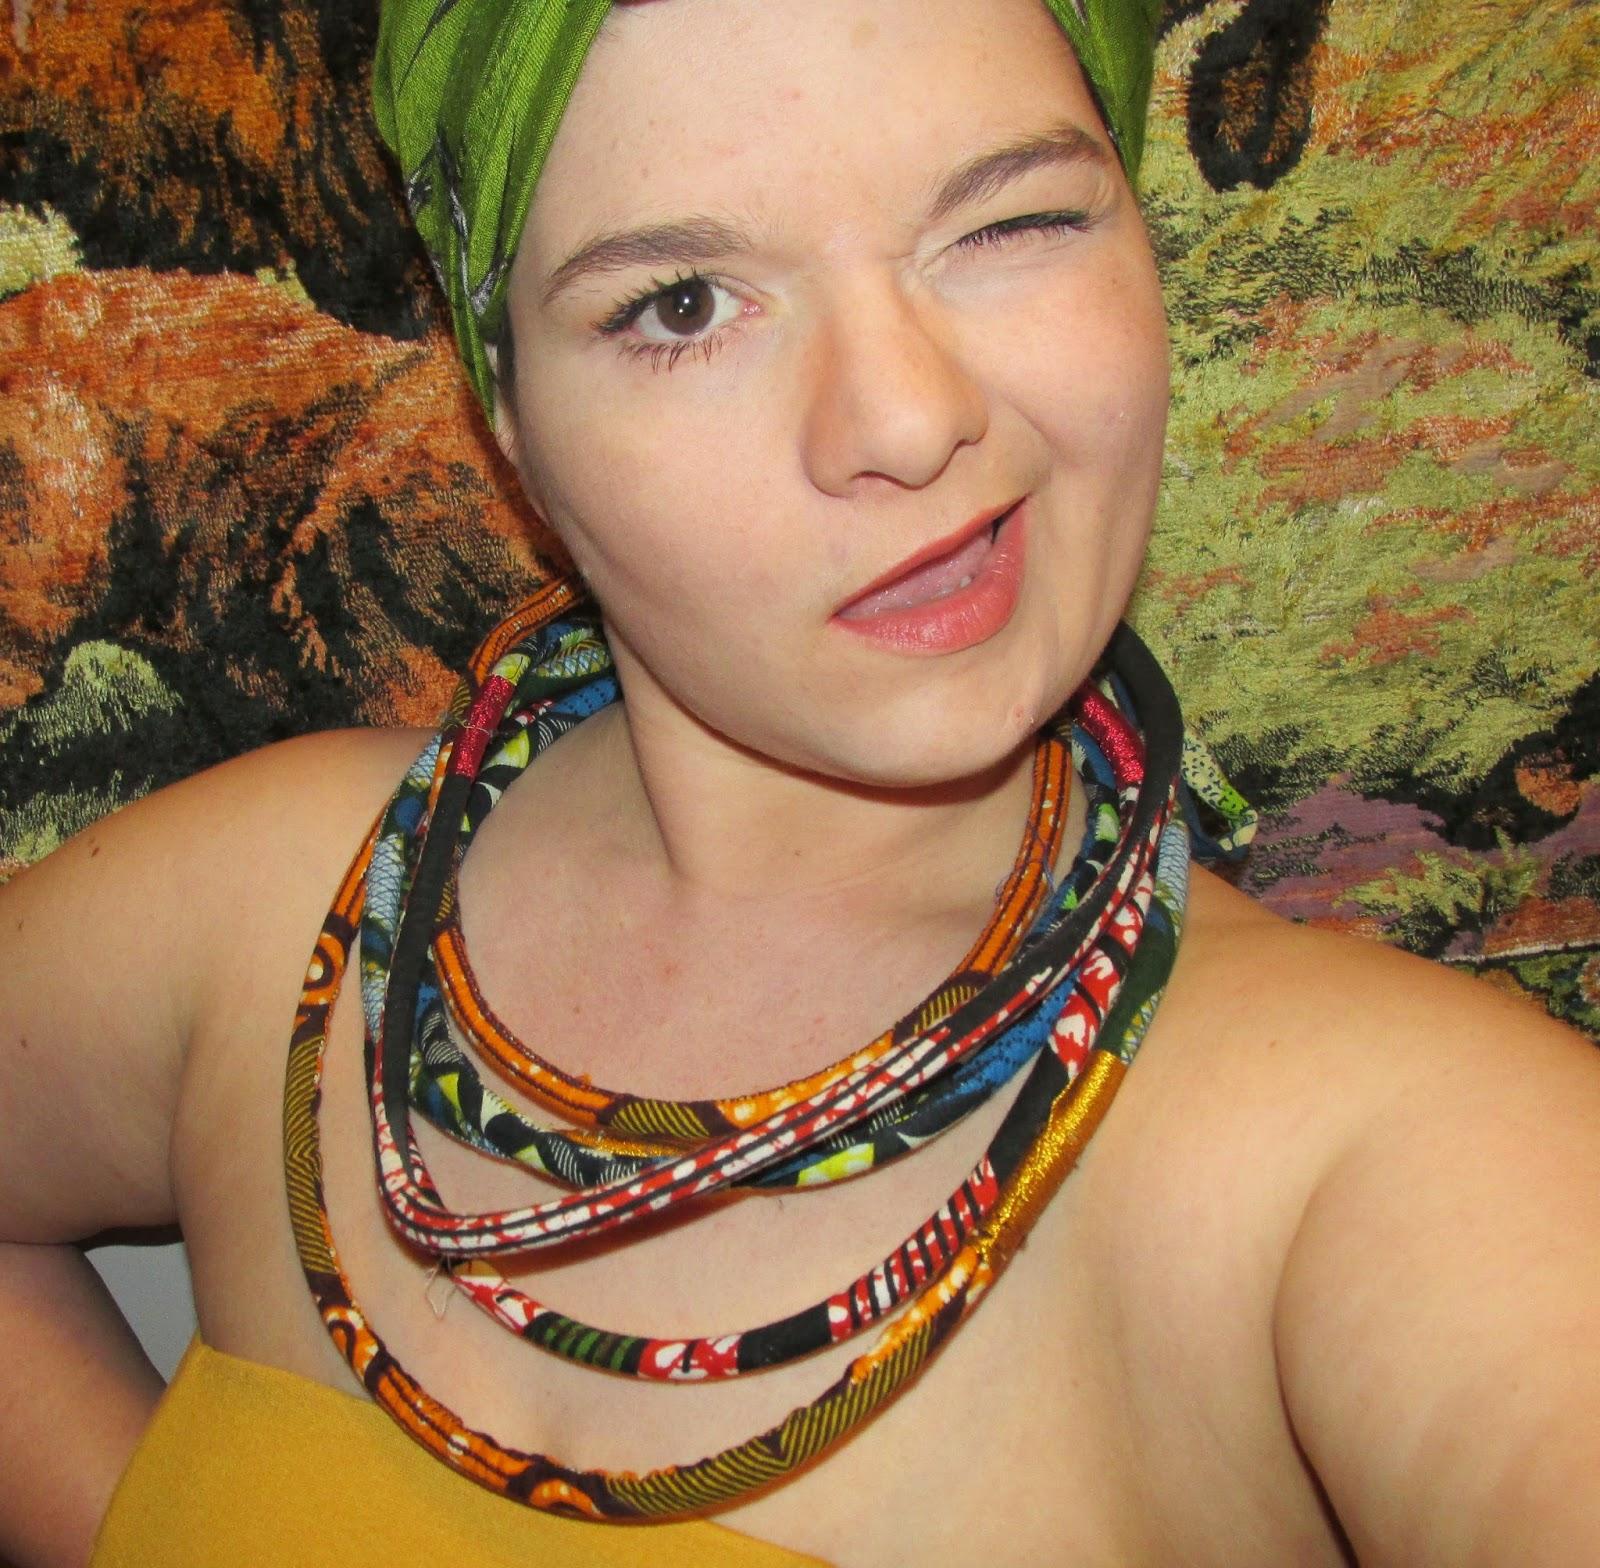 http://leslubiesdelulue.blogspot.fr/2015/04/diy-un-collier-ma-taille-3.html